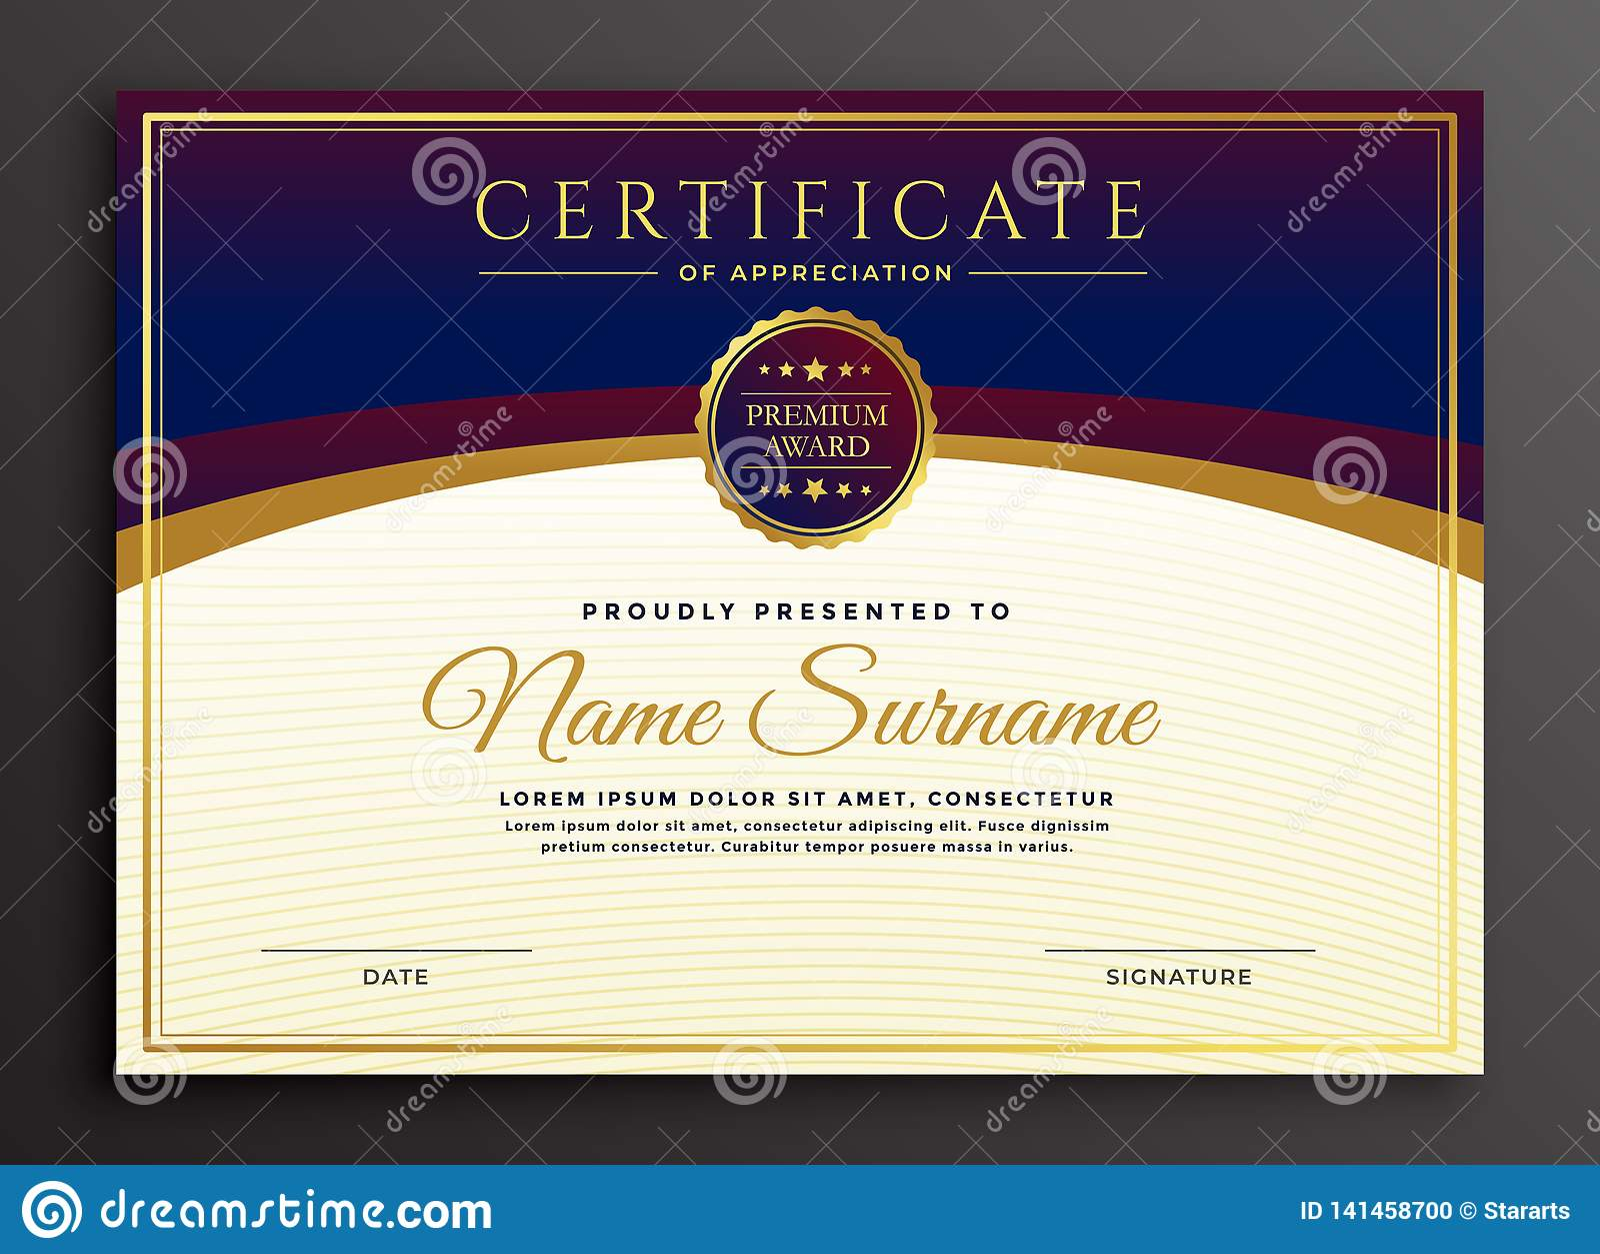 Stylish Certificate Design Professional Template Stock